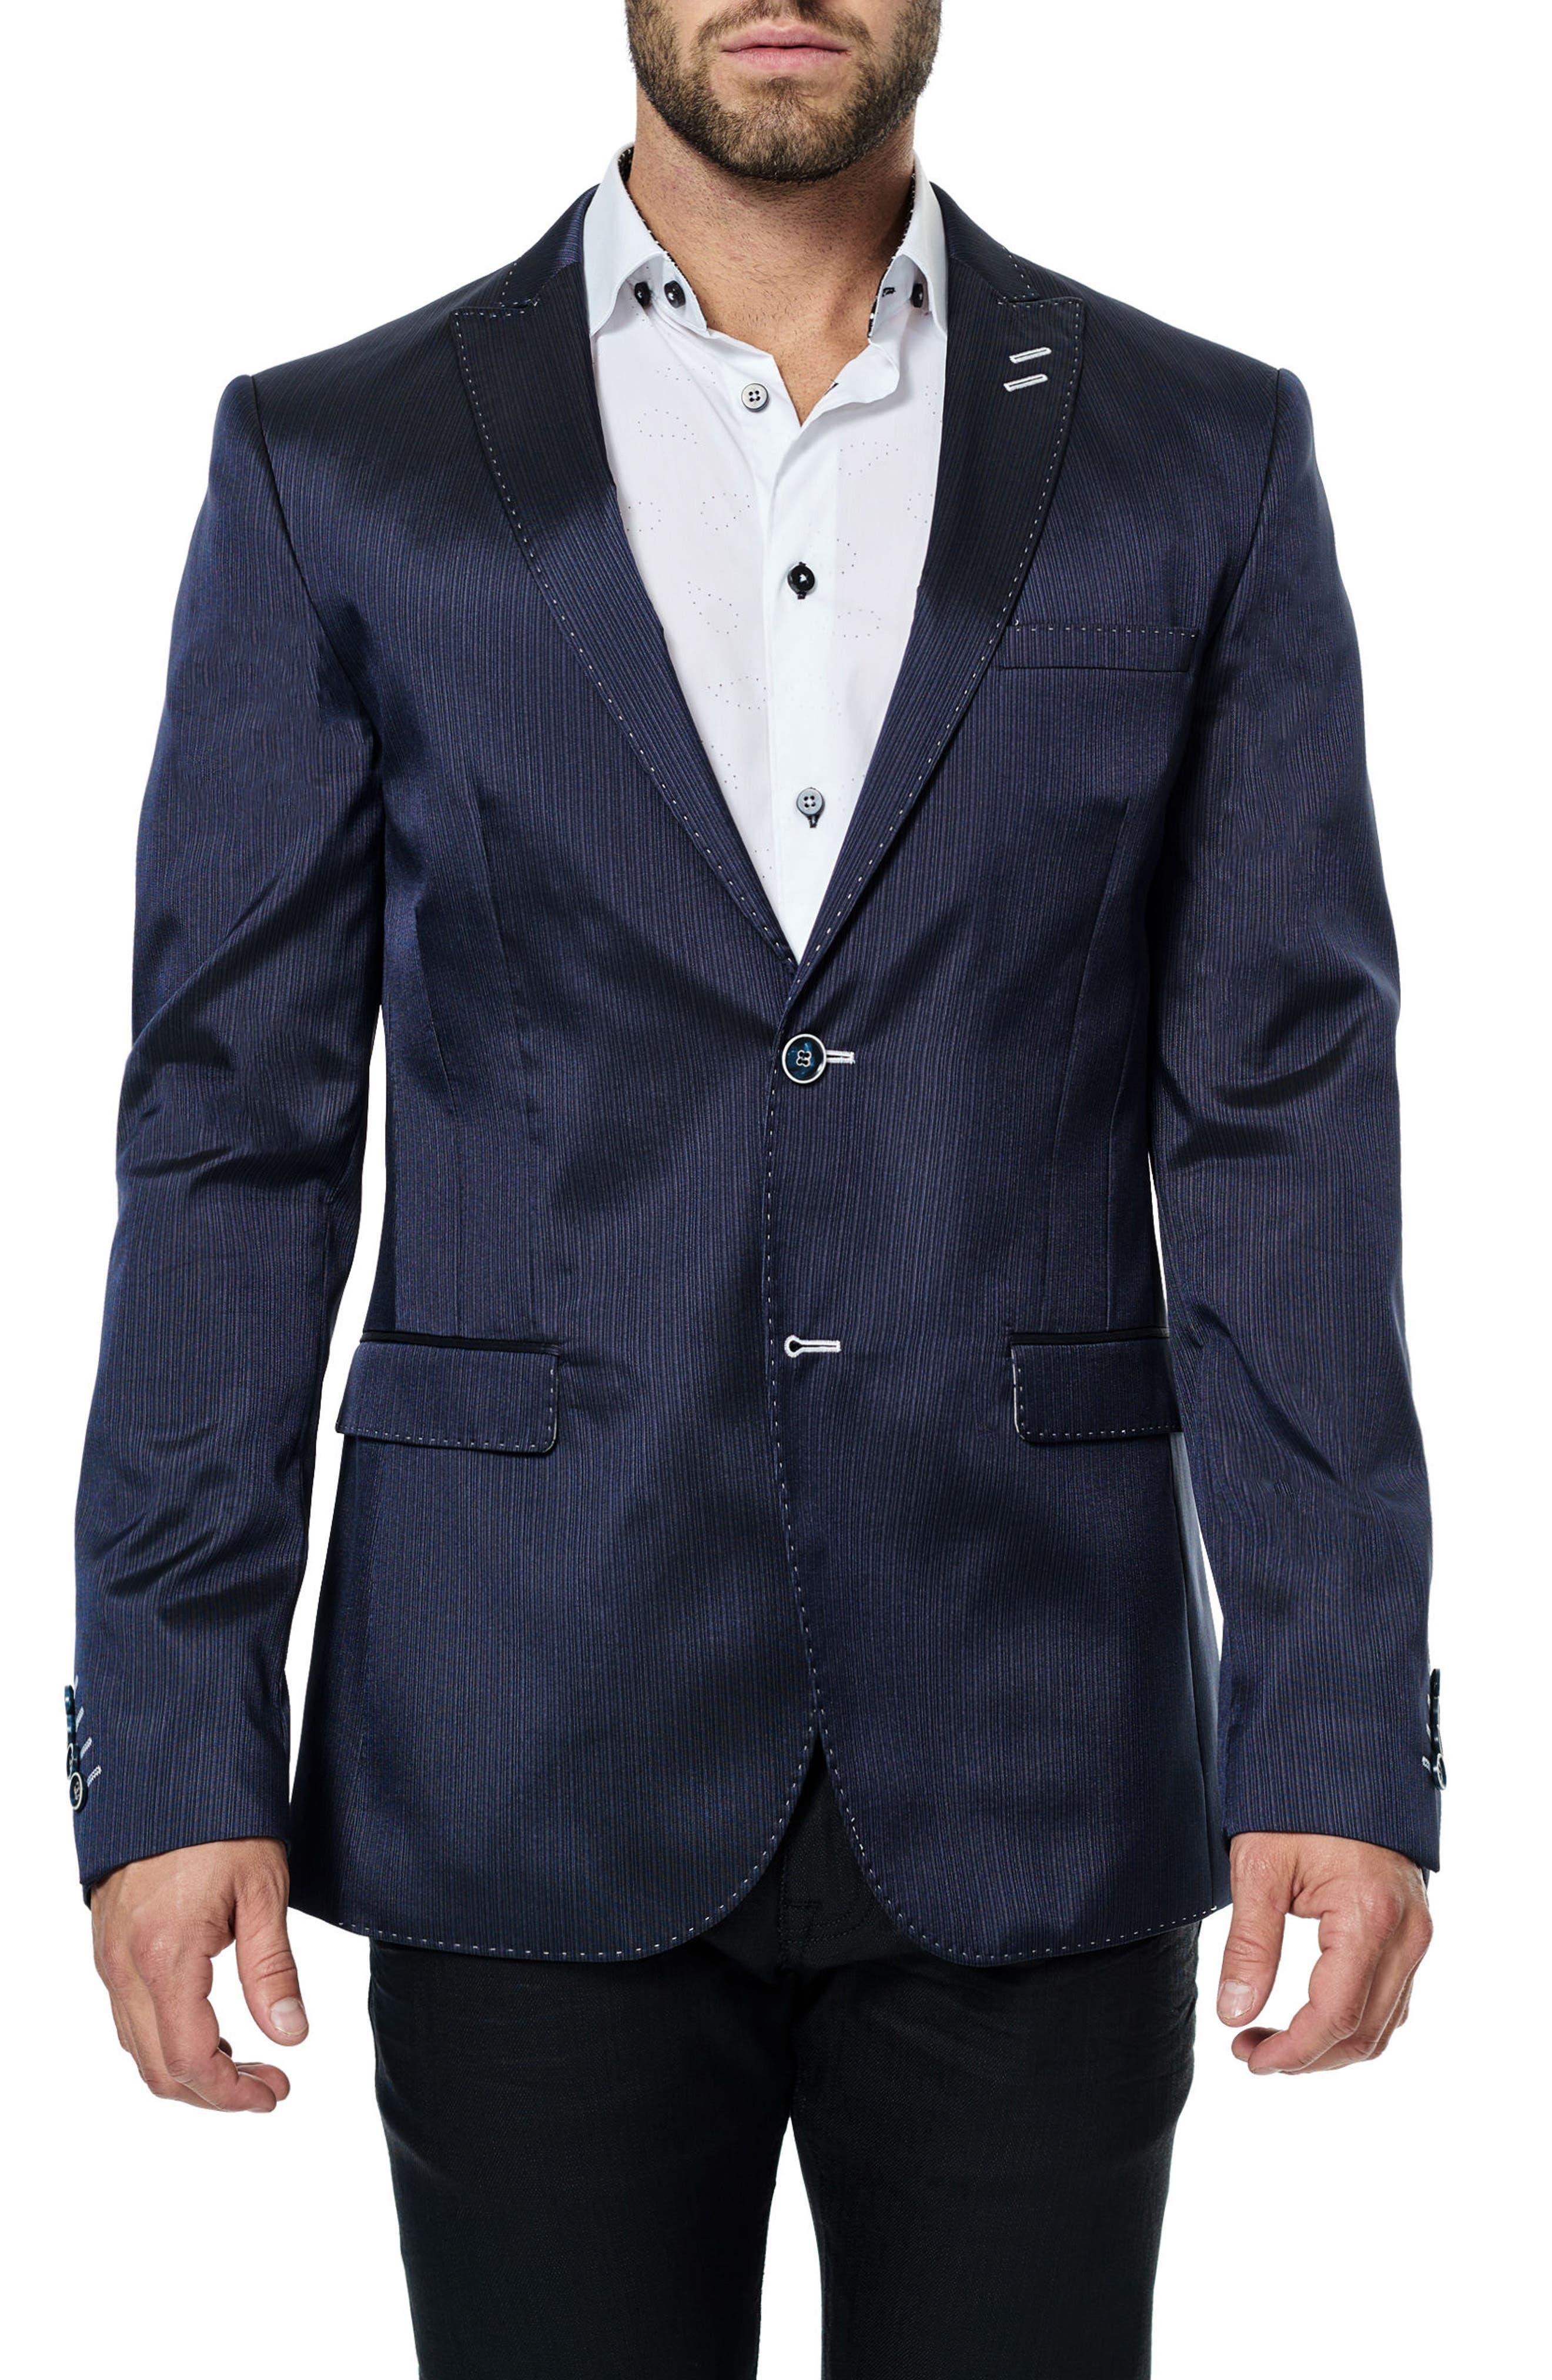 Descartes Stripe Sport Coat,                         Main,                         color, Navy Blue